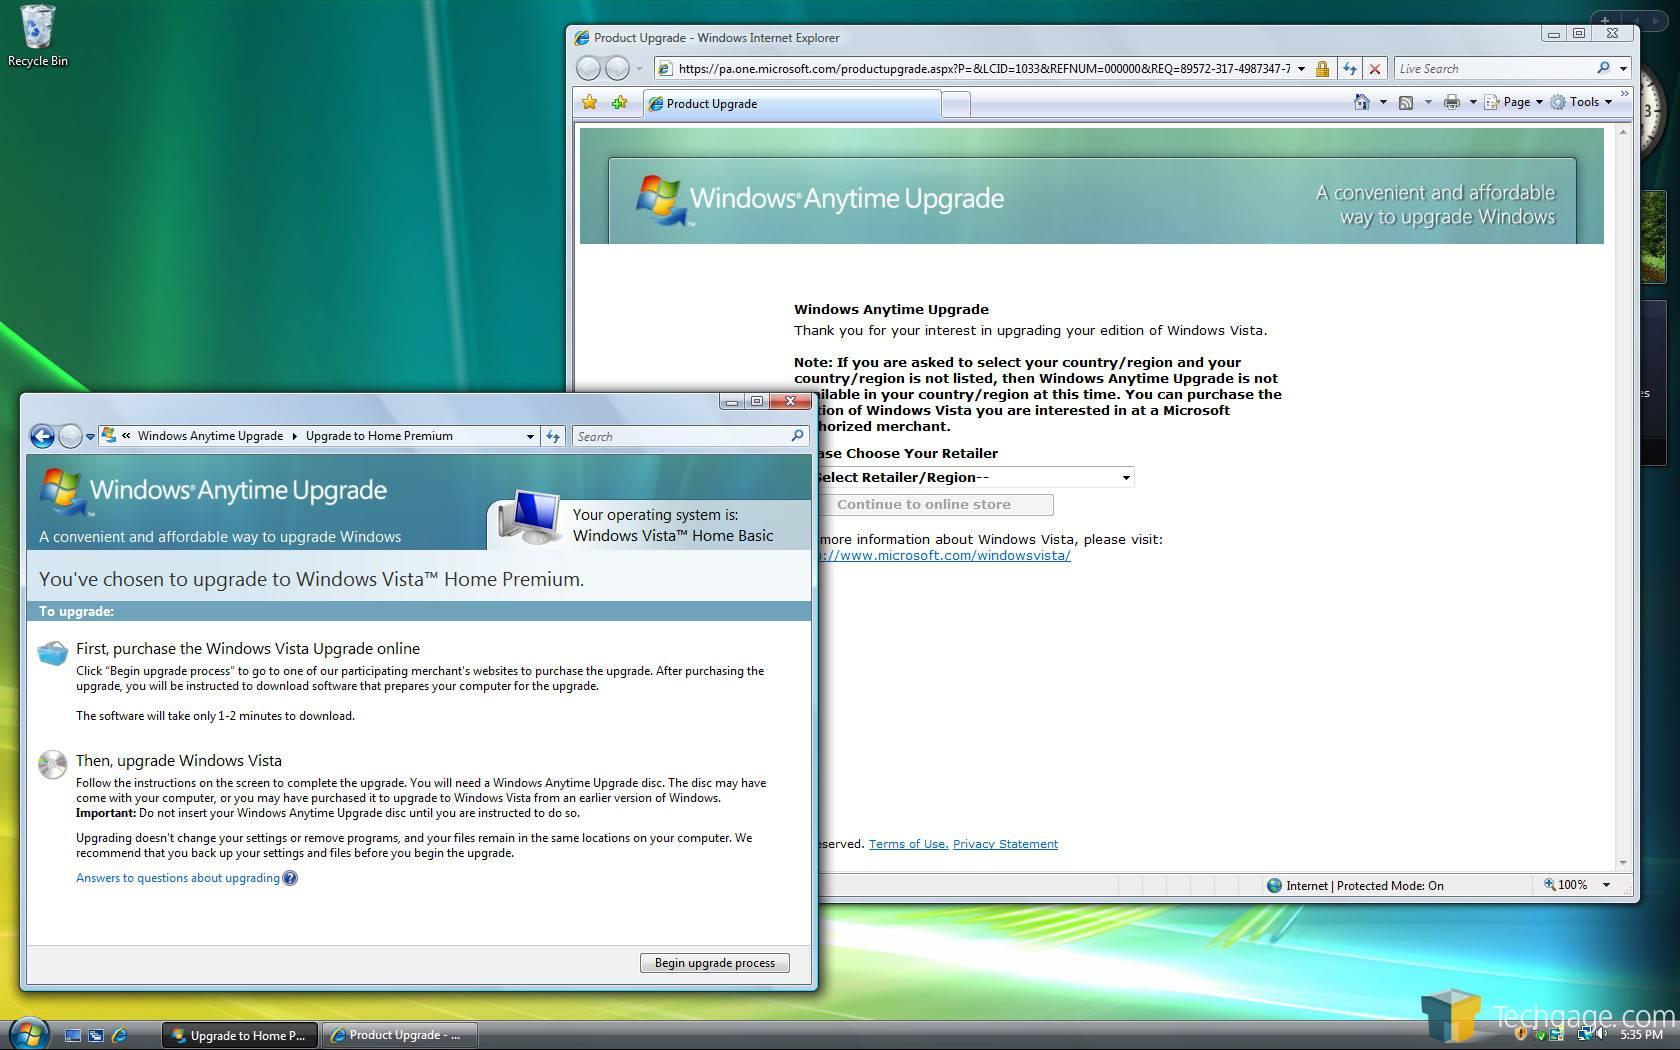 free windows vista upgrade download